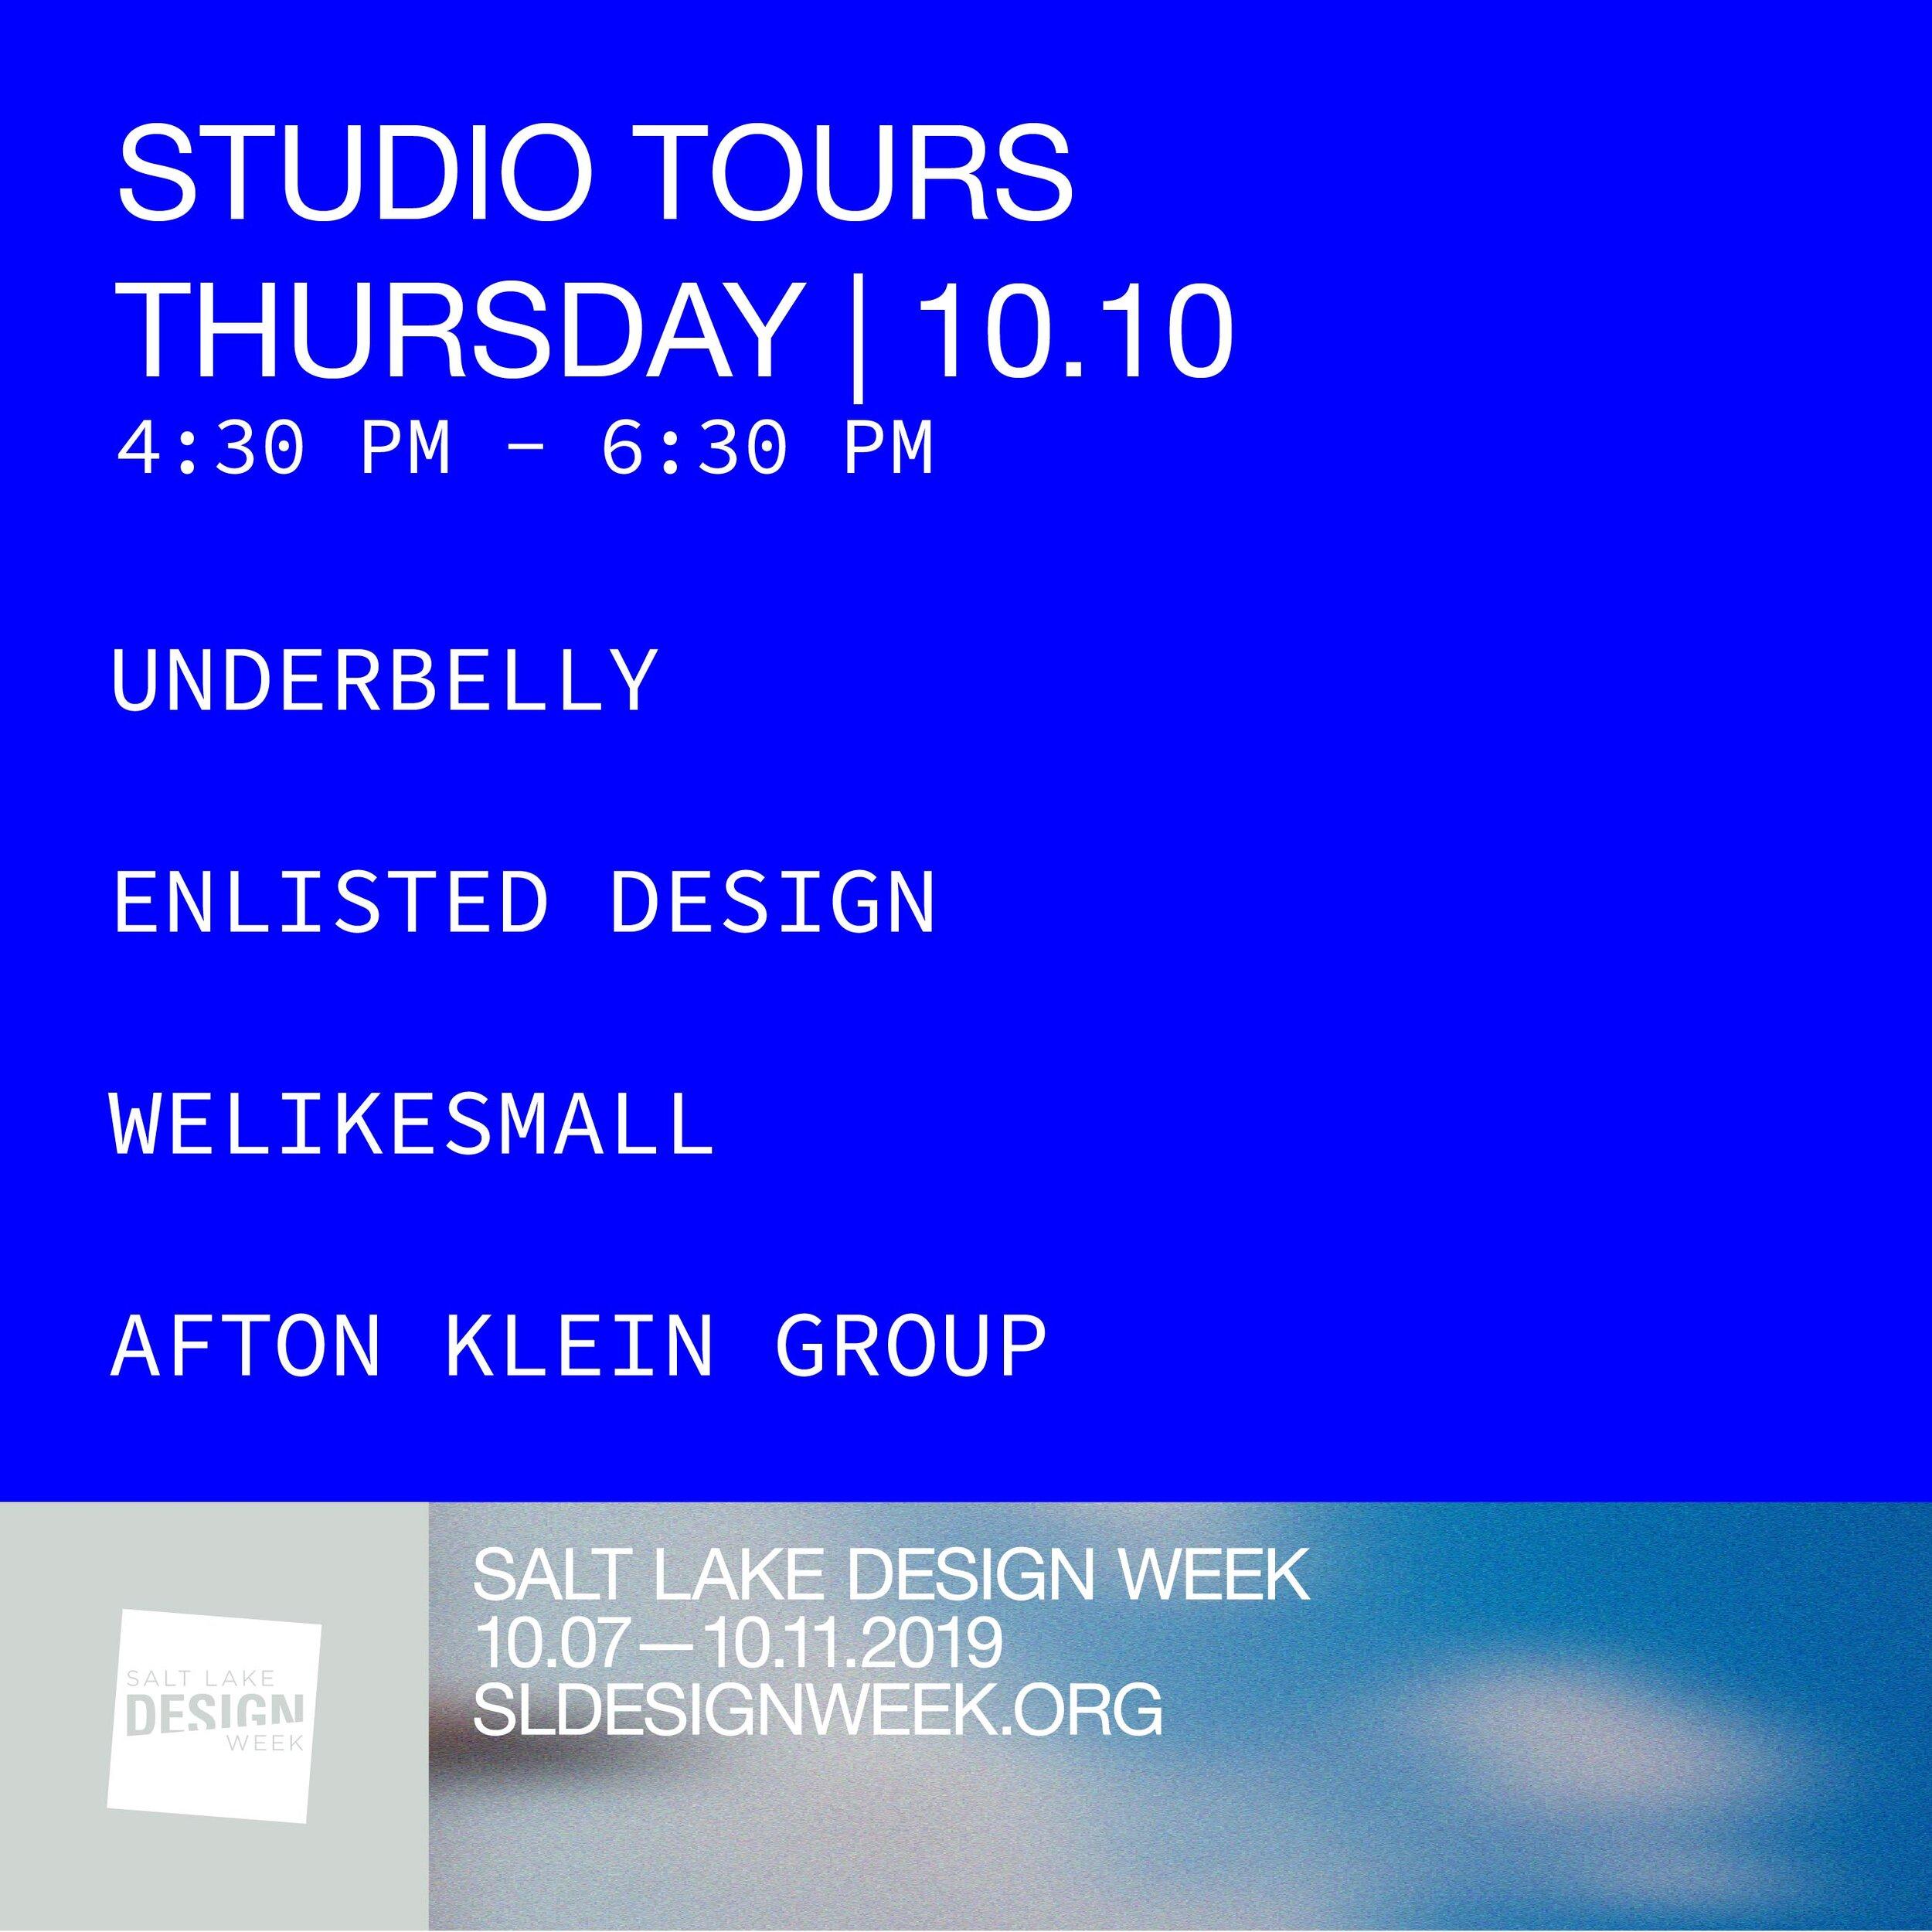 Studio Tours    4:30 PM